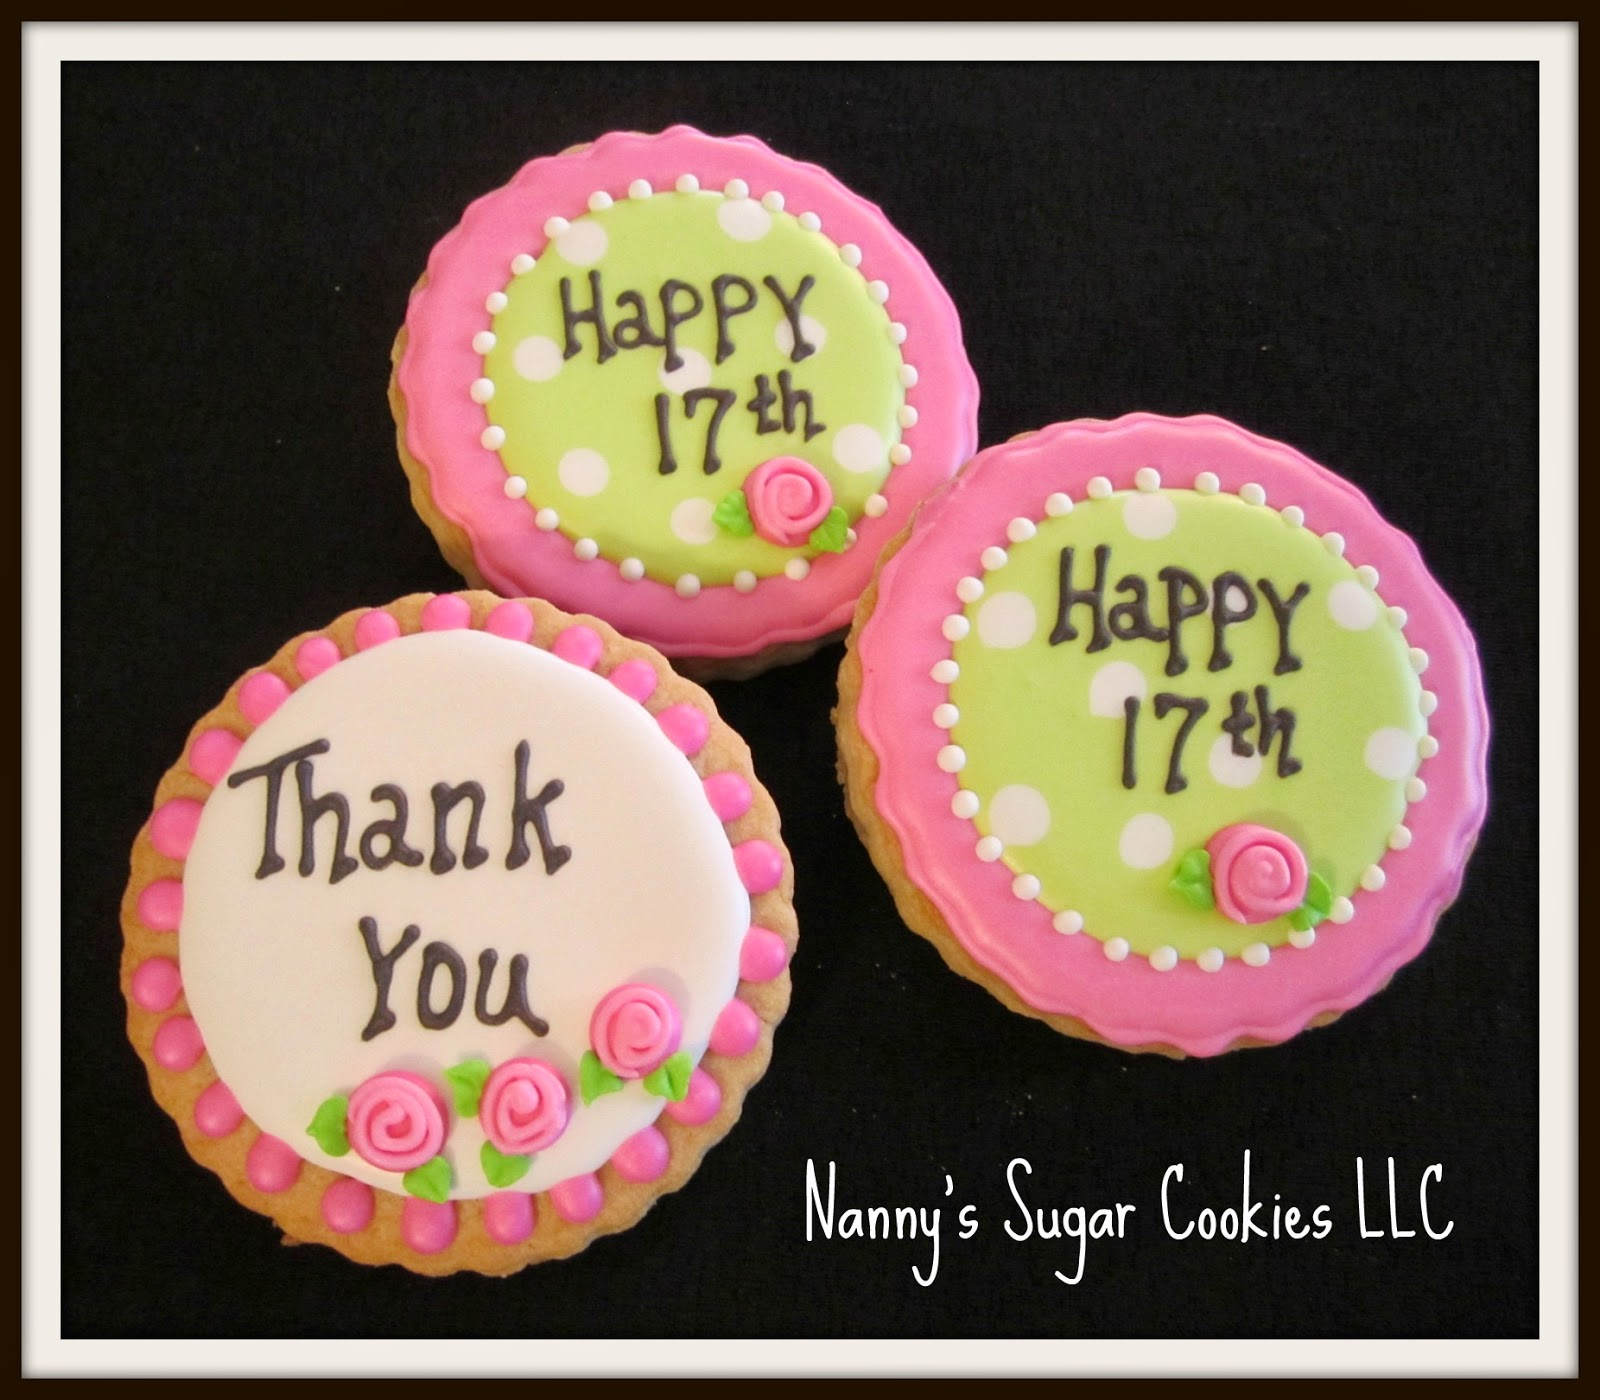 Nanny's Sugar Cookies ... Round Birthday Sugar Cookies